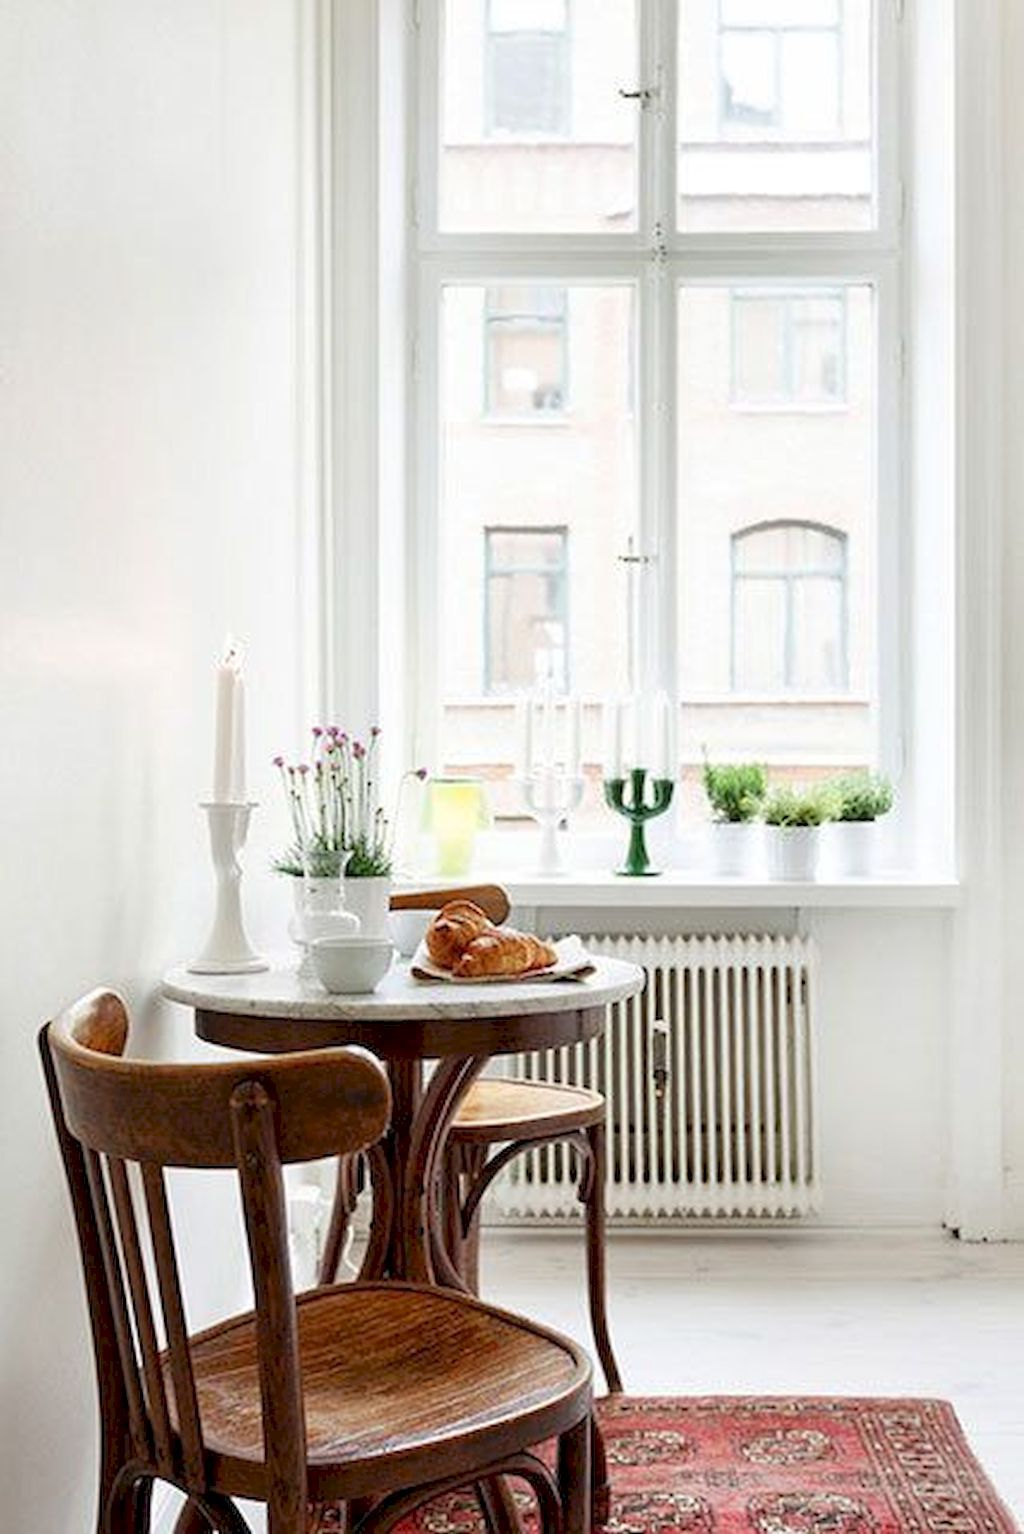 Interior design ideas bistro tables marble bistro table round marble table cafe tables indoor bistro